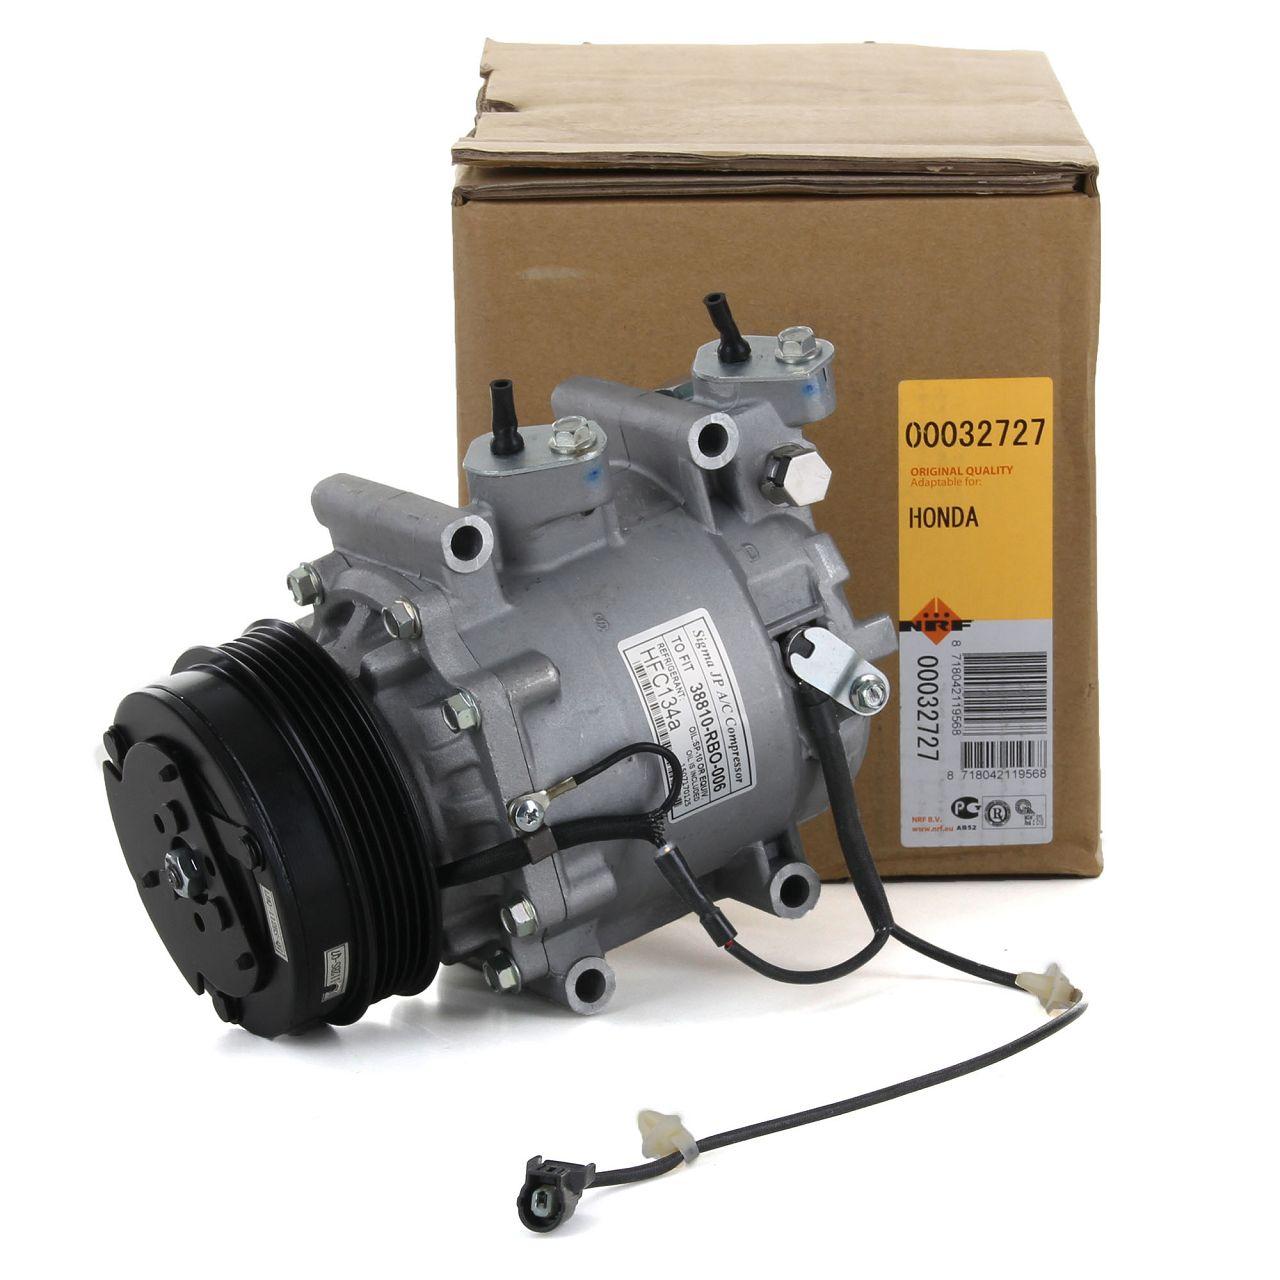 NRF 32727 Kompressor Klimaanlage EASY FIT für HONDA JAZZ III 1.2 1.3i 1.4